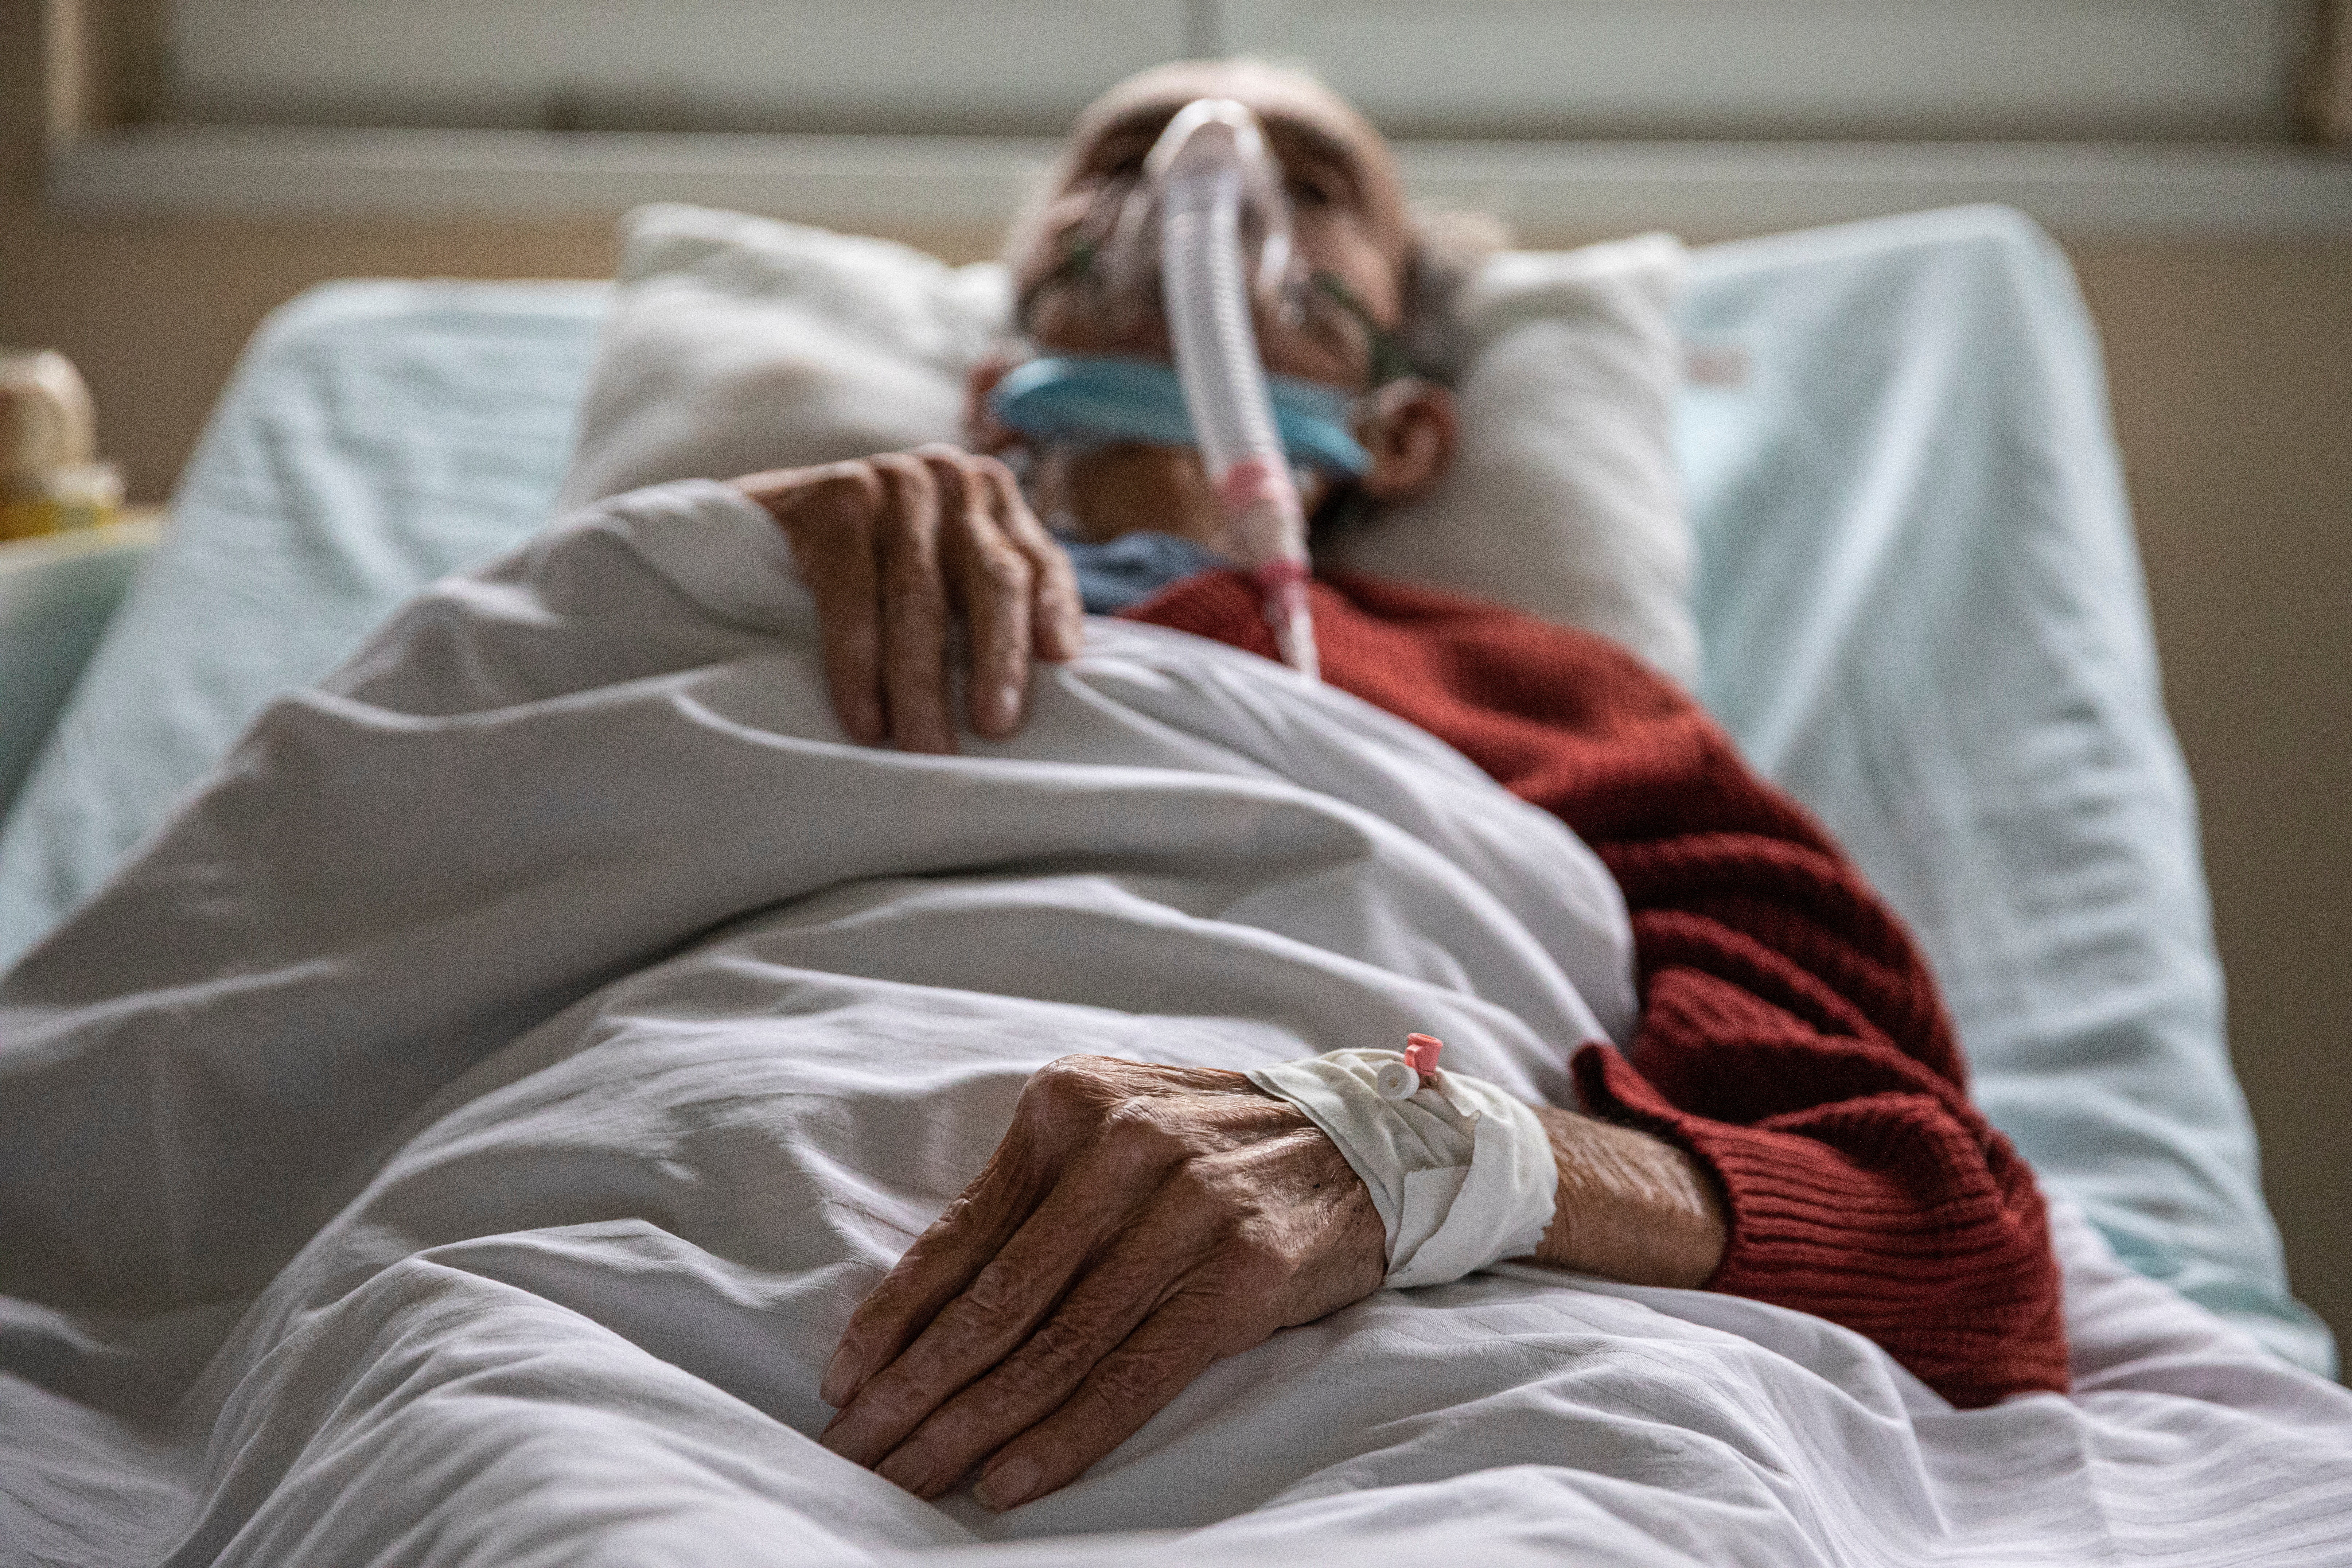 coronavirus covid19 health disease pandemic virus patient hospital lungs study arteries blood clots damage symptoms sars tissue heart liver kidney